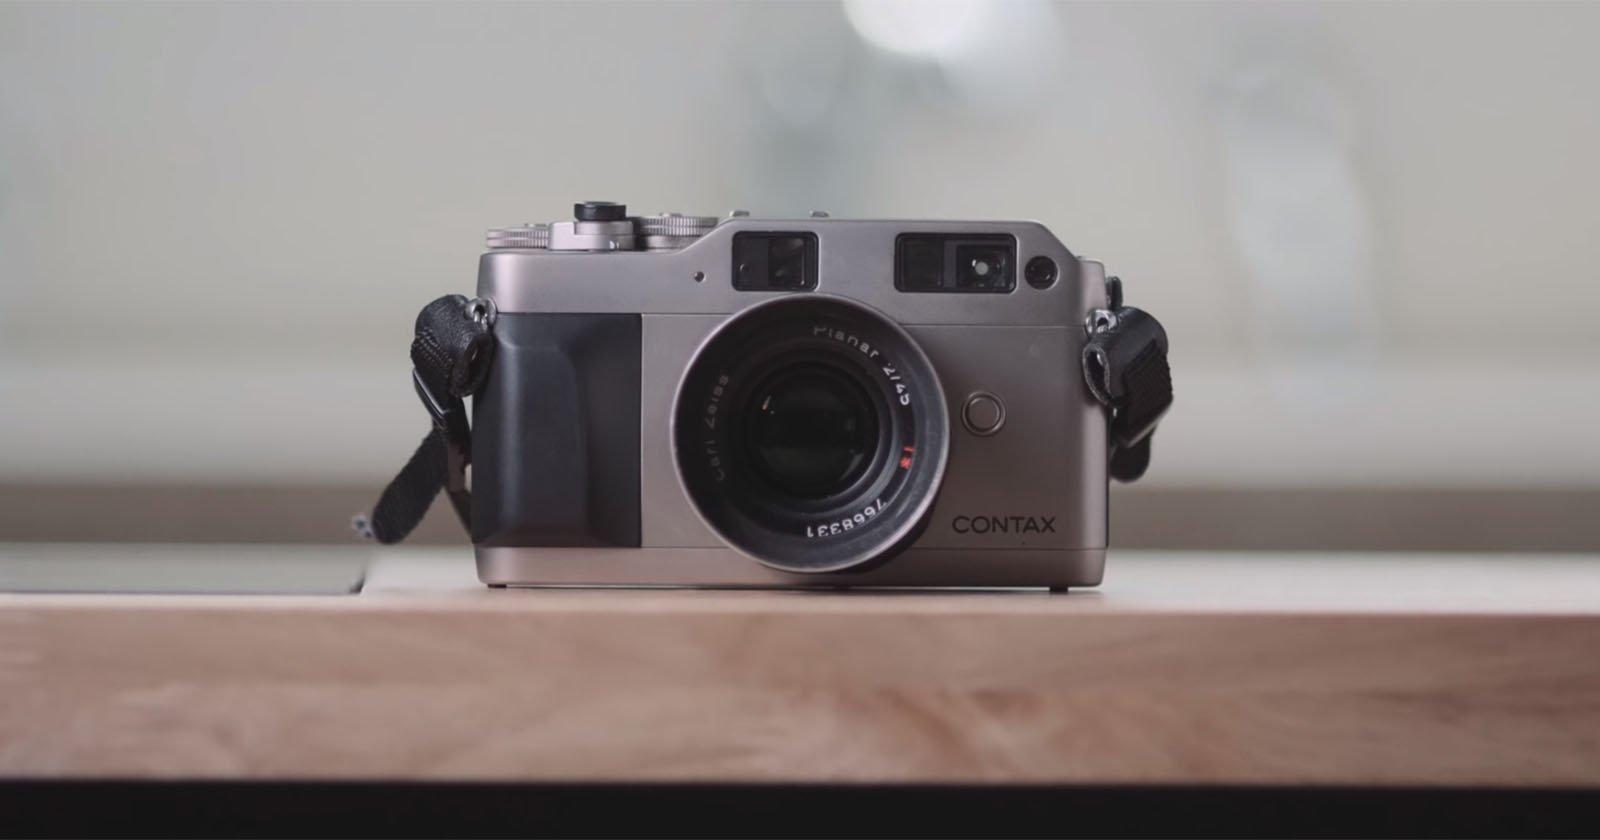 Buying 35mm camera film in Hong Kong